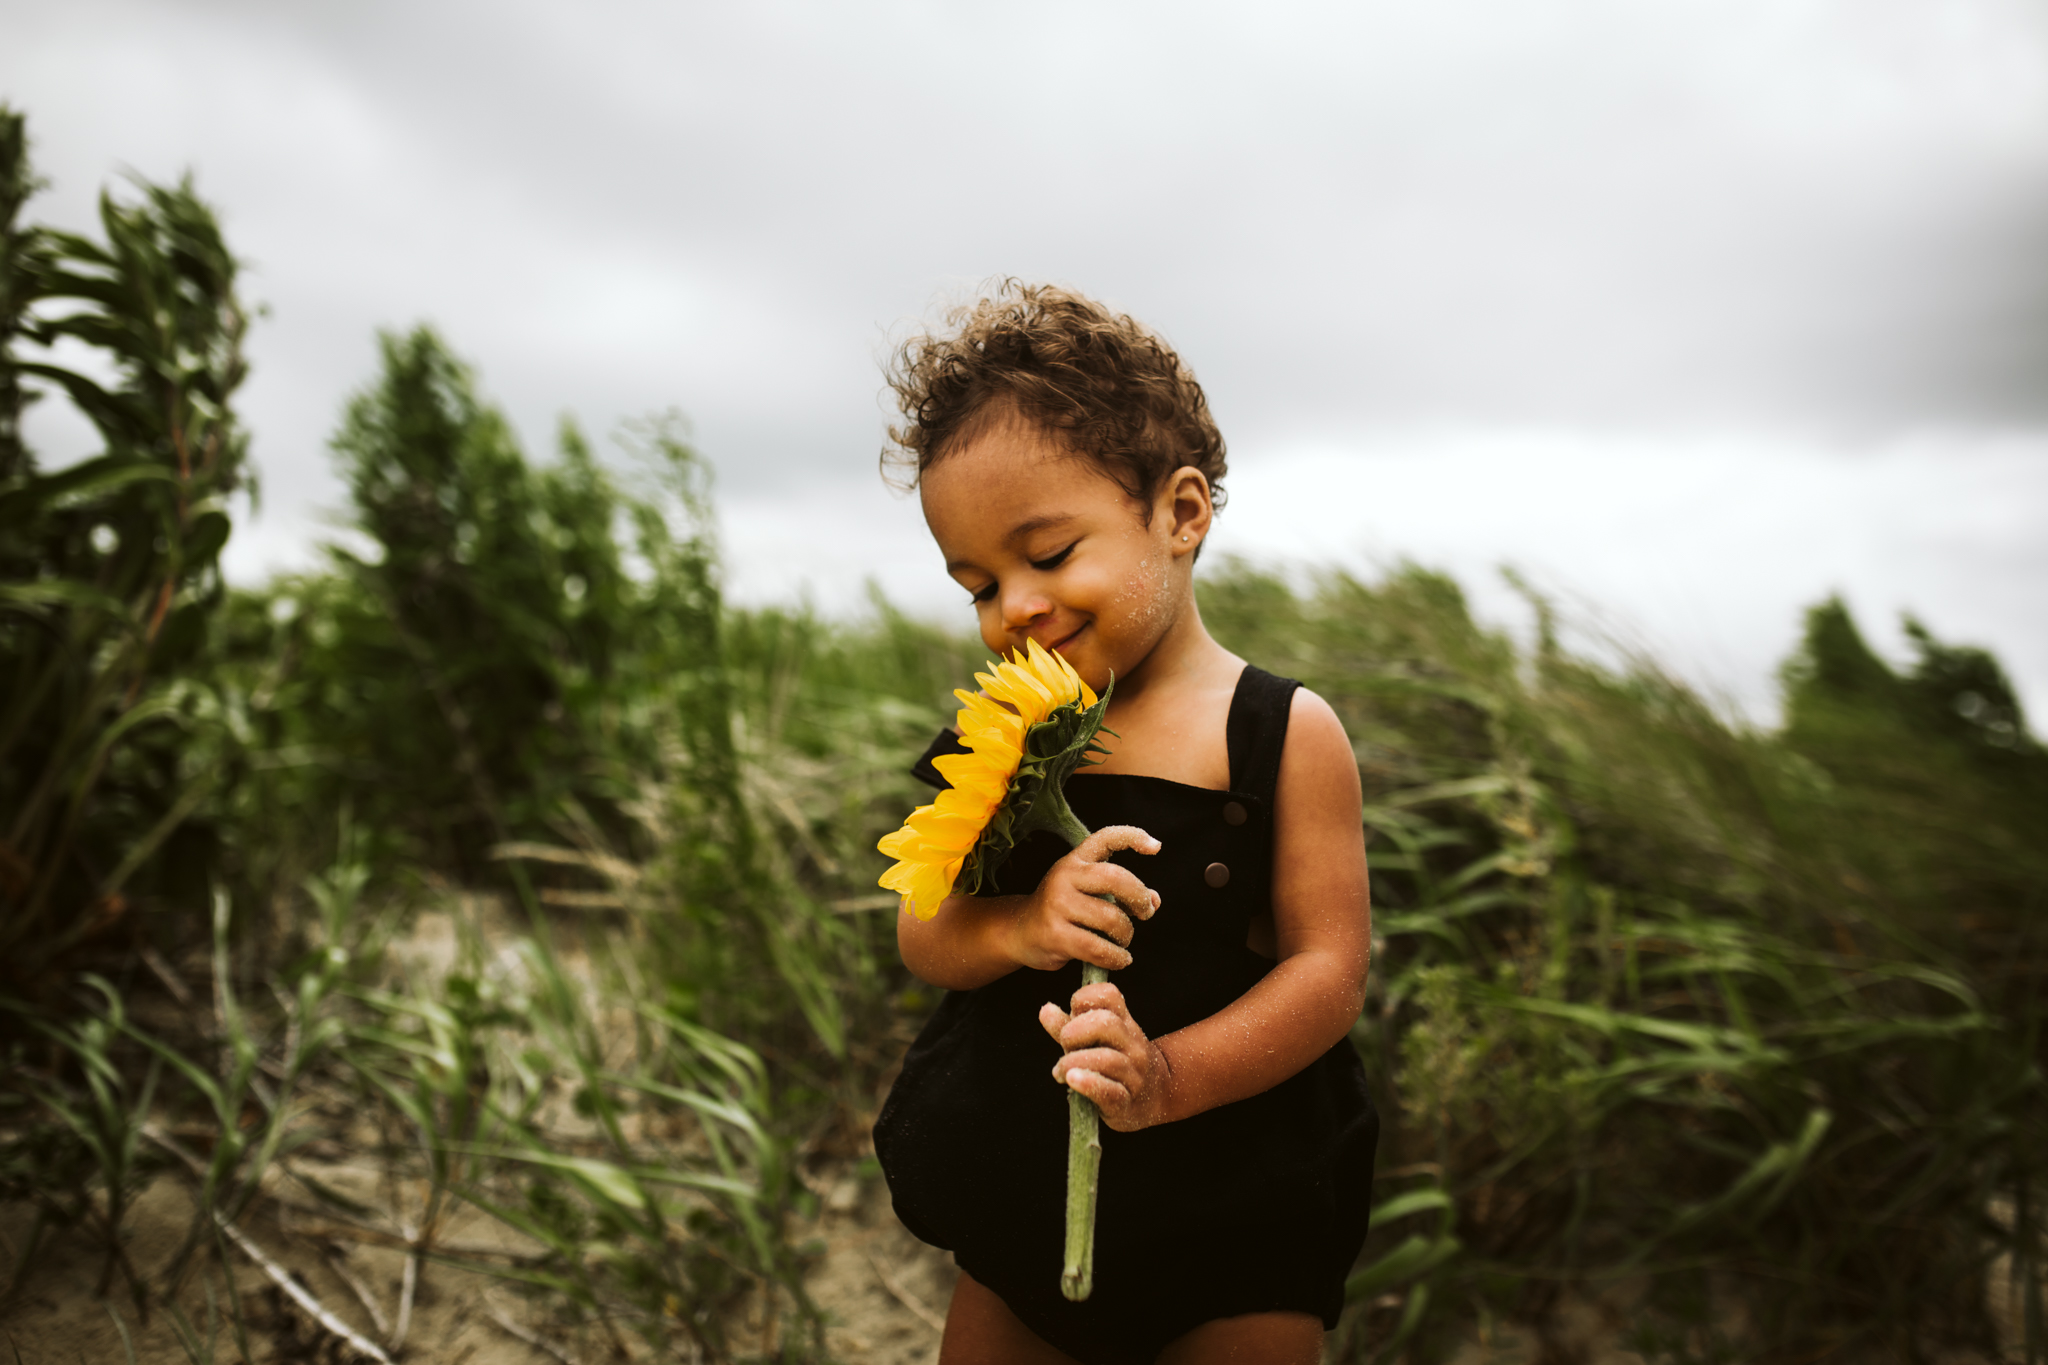 RebeccaBurtPhotography.FortMonroe.HamptonRoadsPhotographer.LifestylePhotographer.HamptonVirginia.StephaniePierre-67.JPG